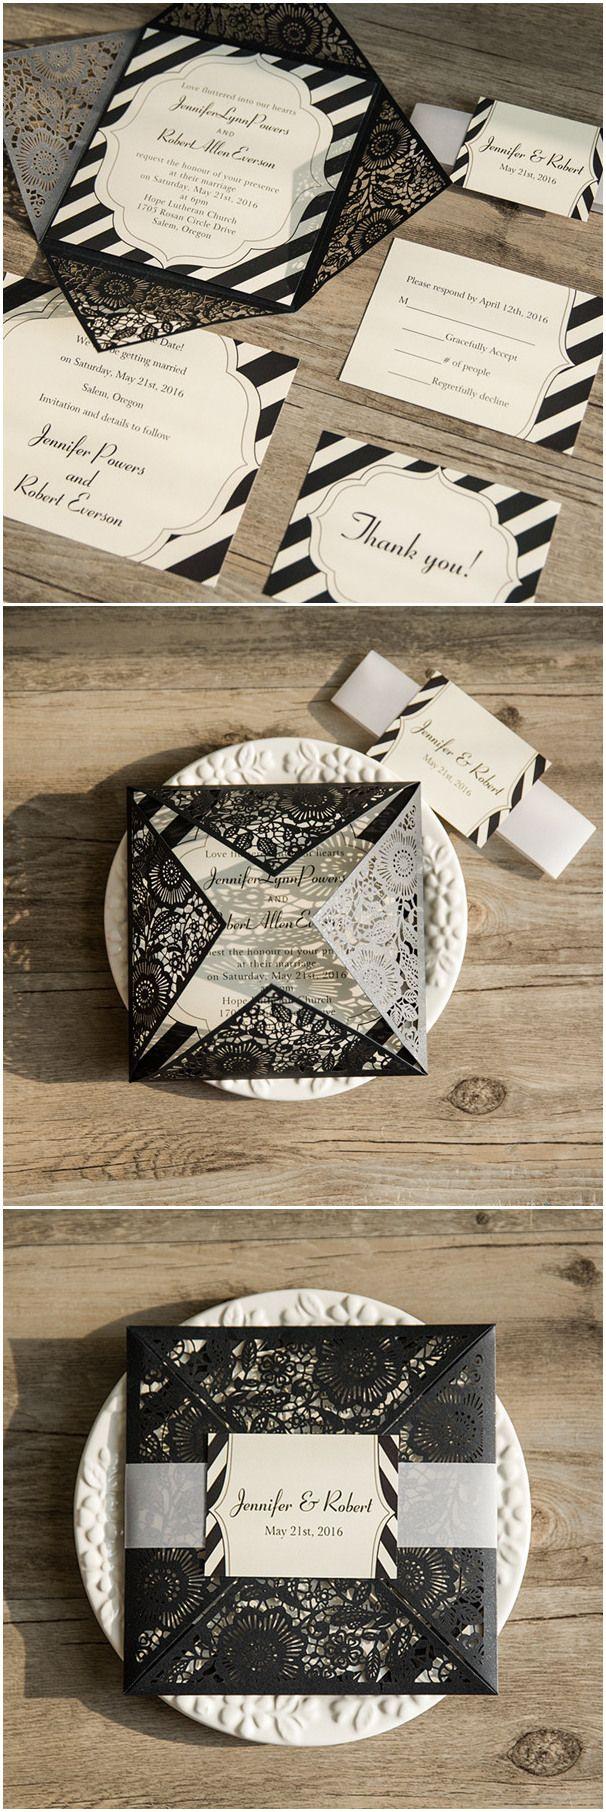 black laser cut pocket with striped inner cards wedding invitations @elegantwinvites